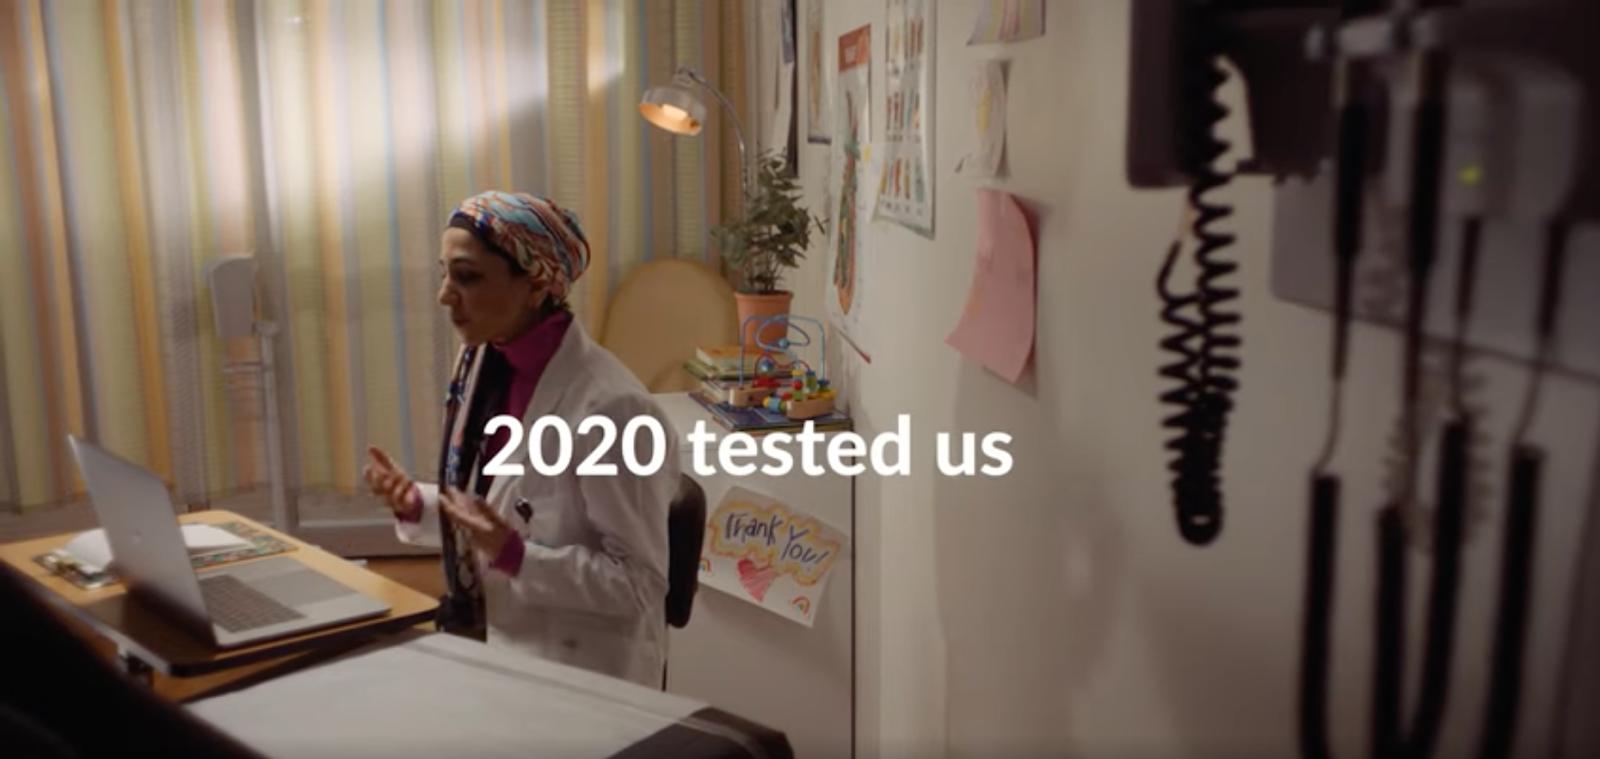 Zoom COVID-19 YouTube ad